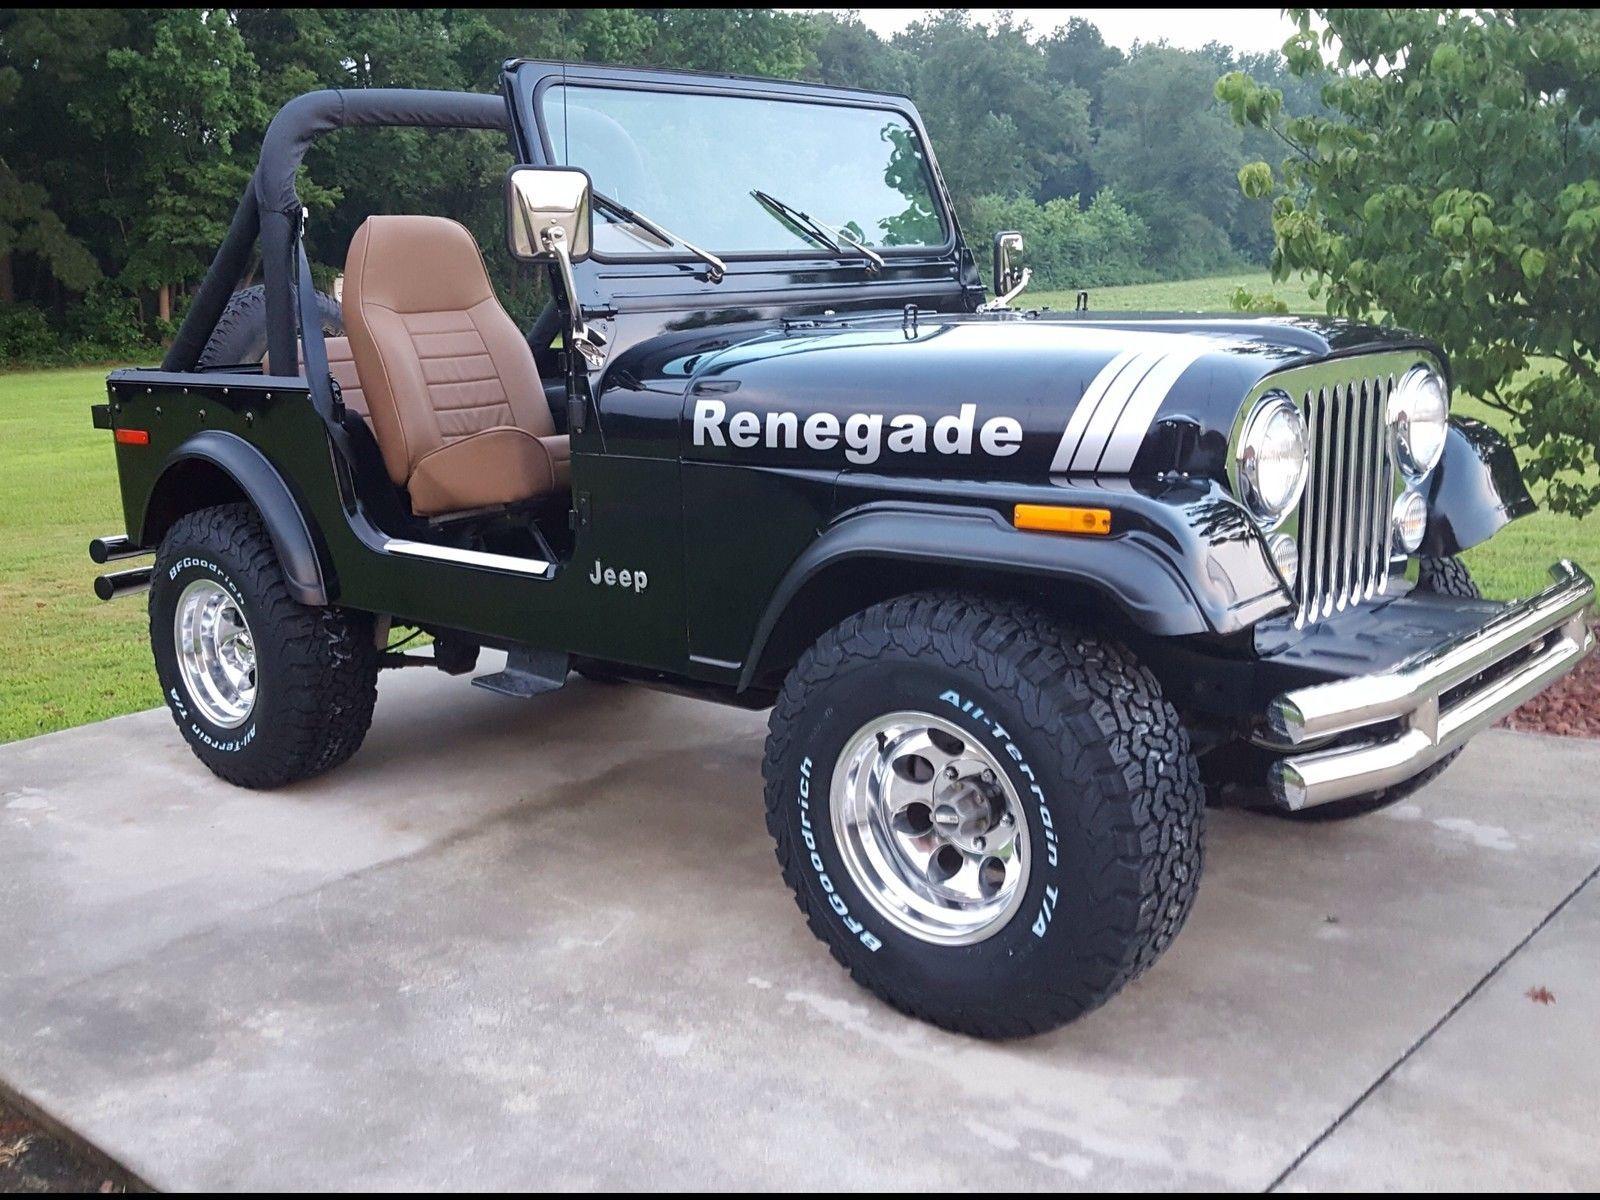 Jeep cj7 renegade sport utility 2 door in v hicules pi ces automobiles